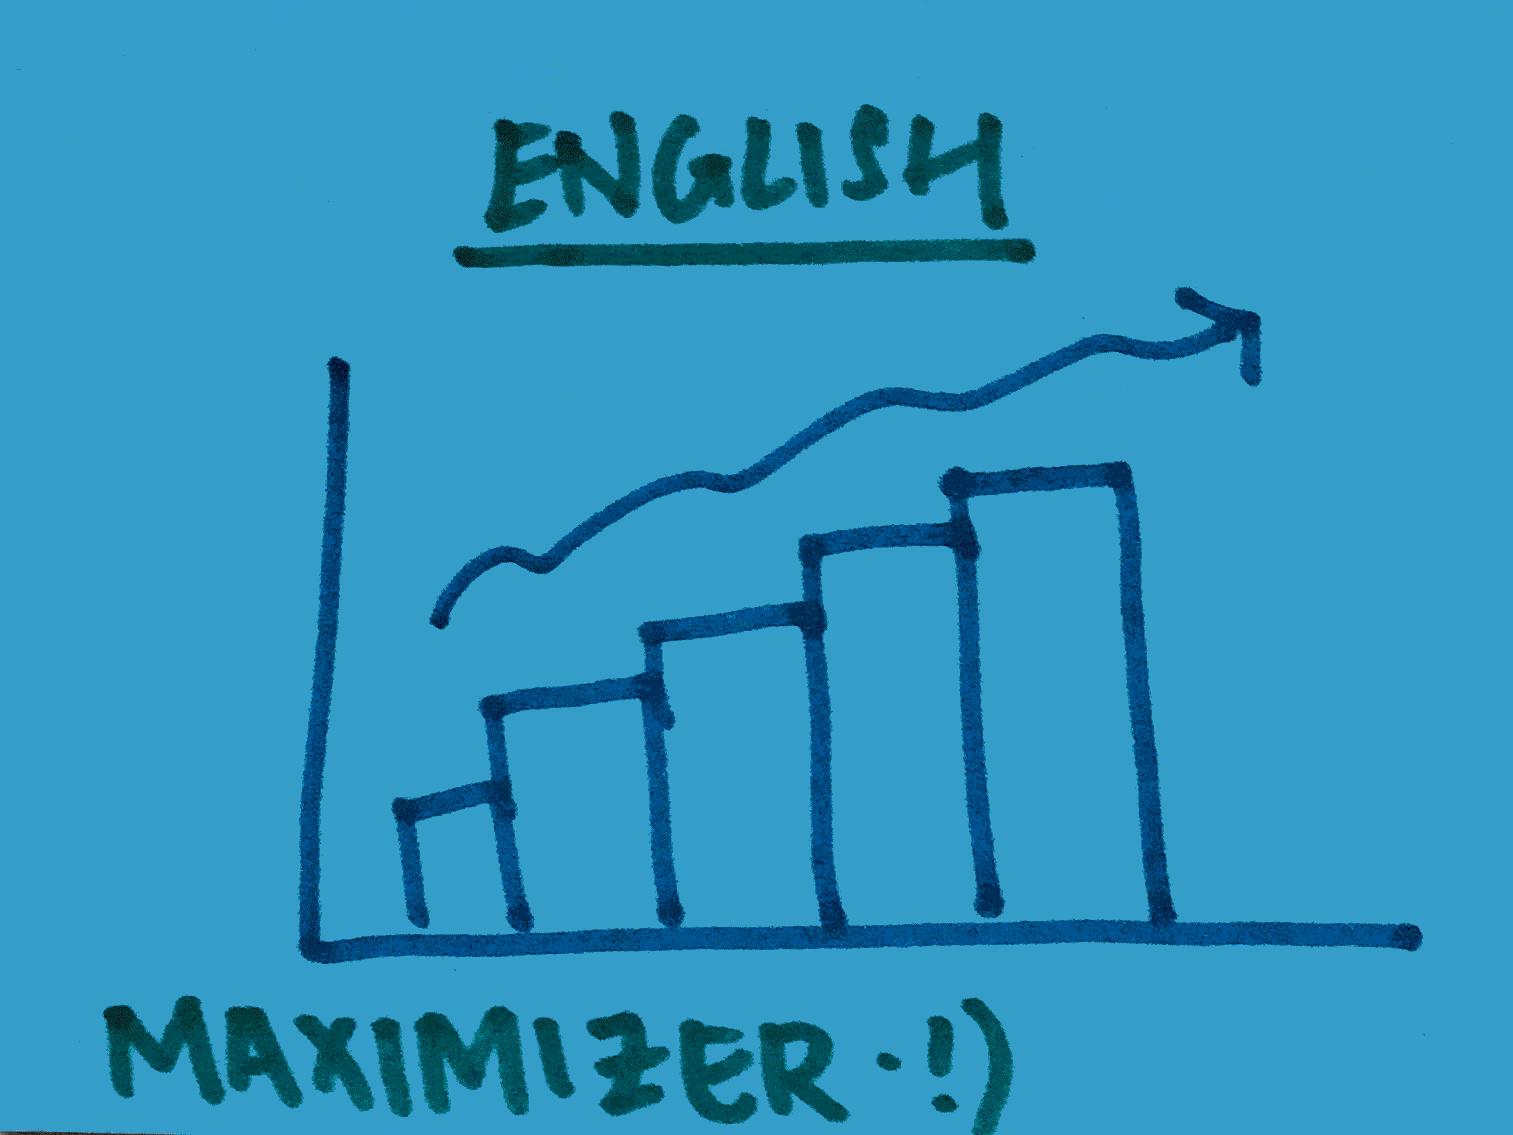 Maximizer Strengthsfinder Singapore English Improvement